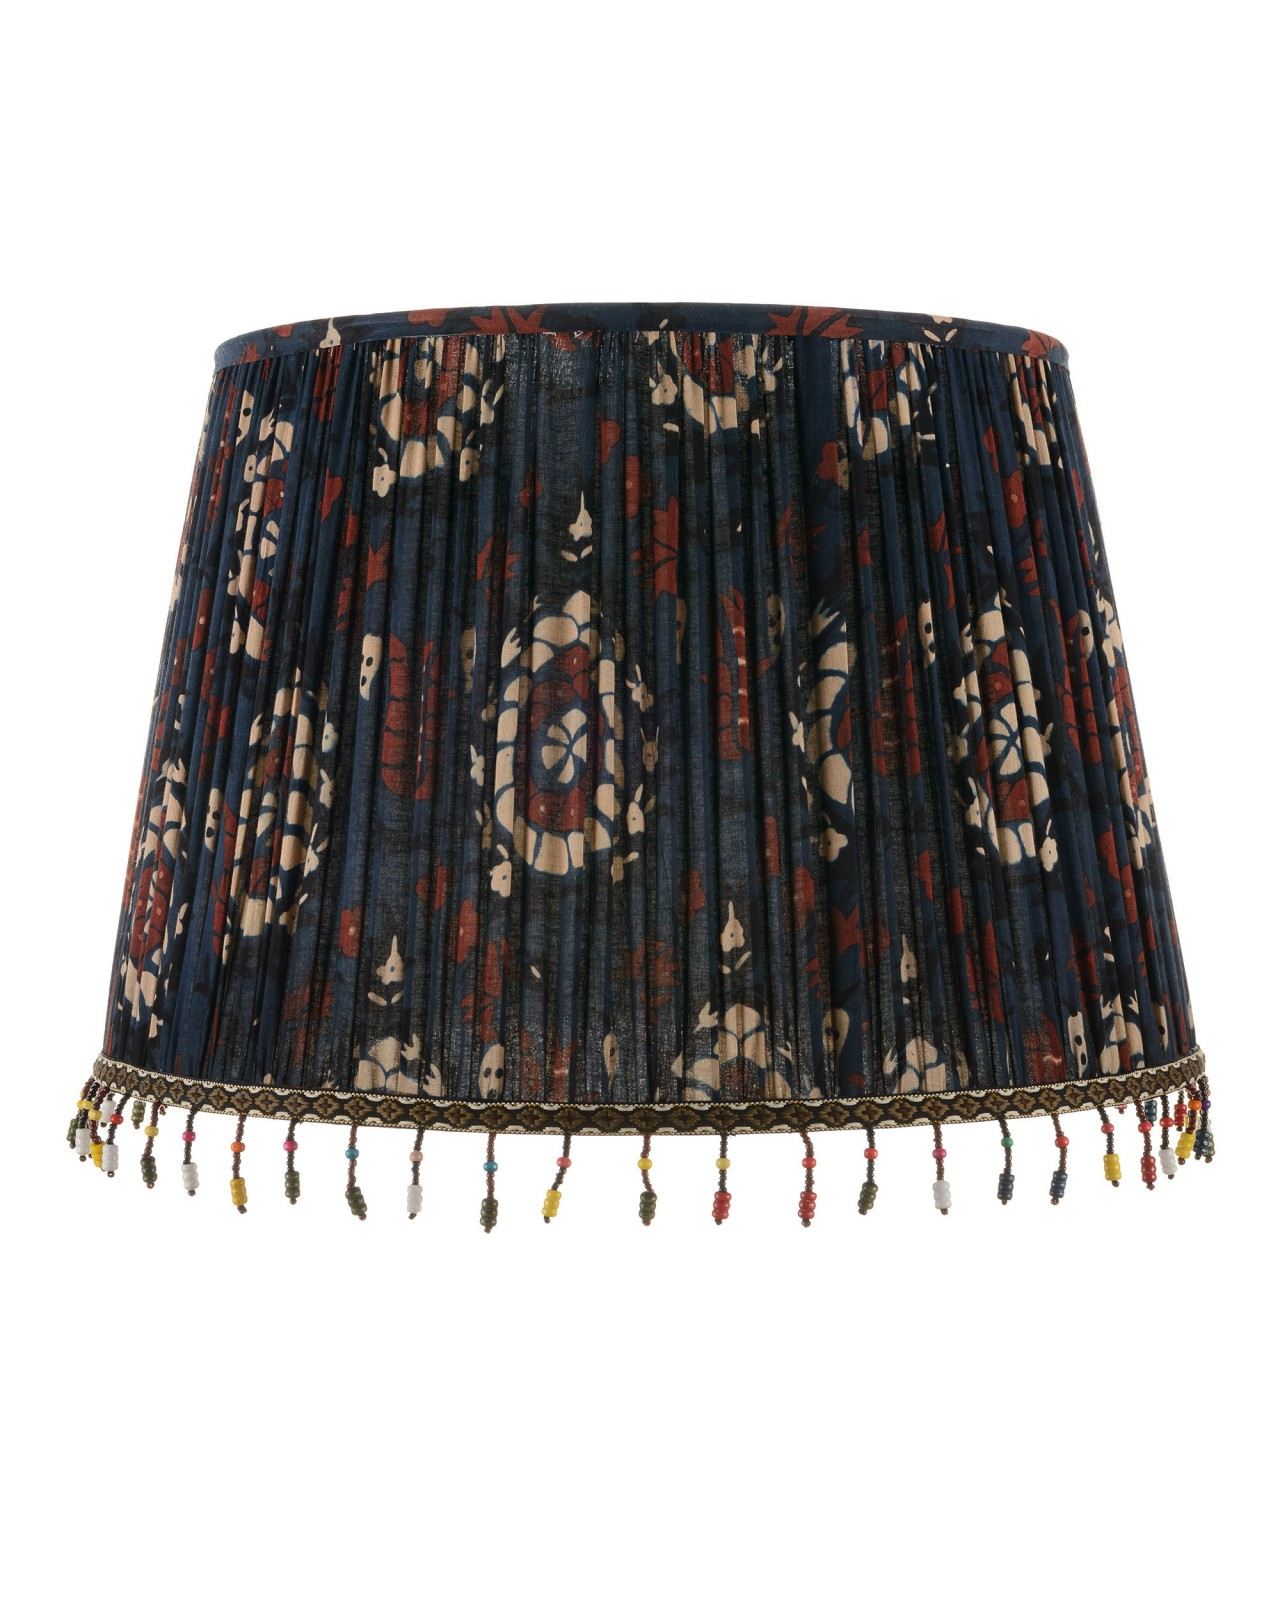 FLOURISH BLUE Pleated Lampshade